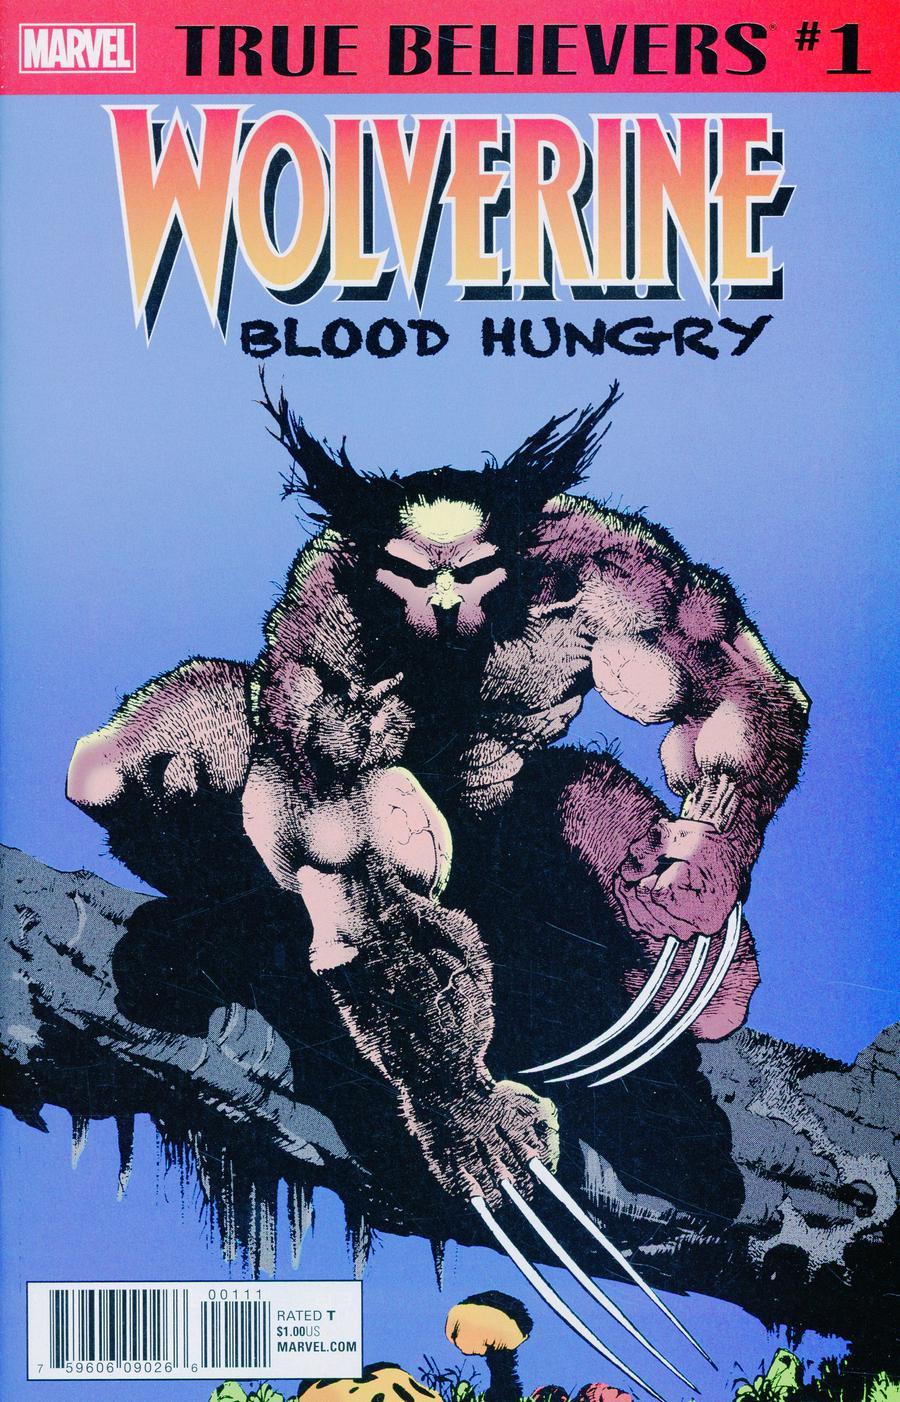 True Believers Wolverine Blood Hungry #1